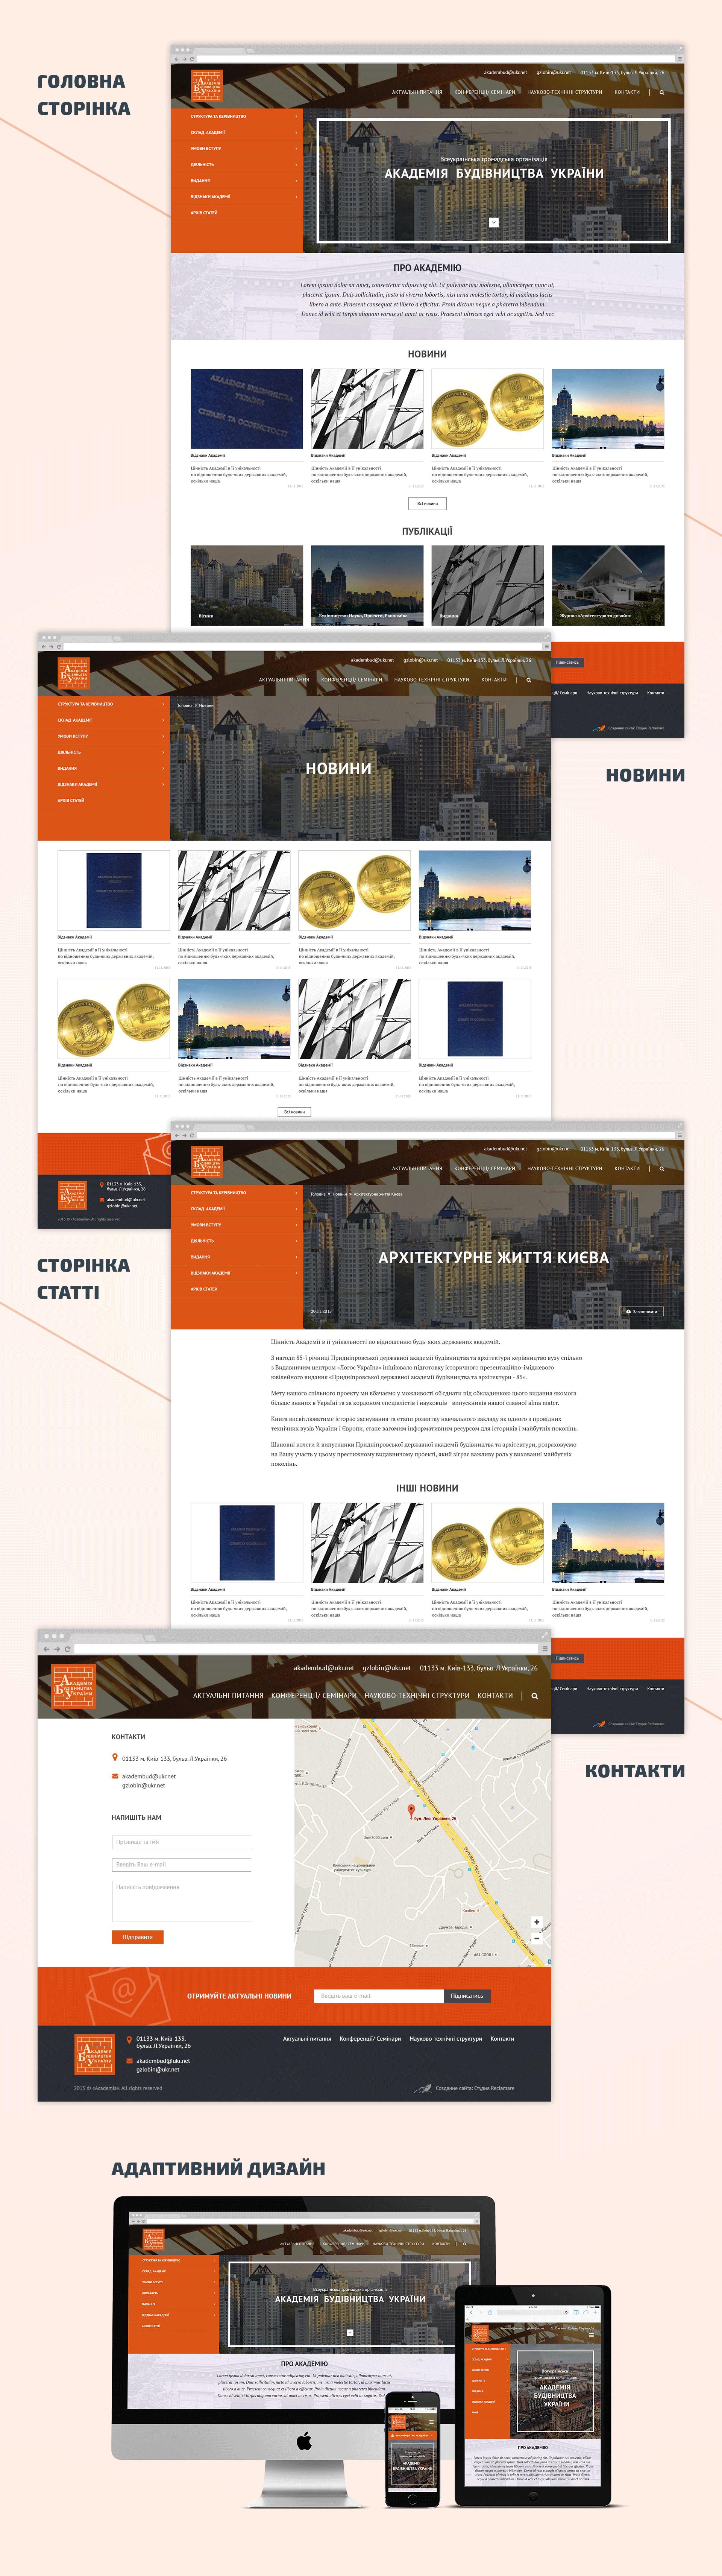 Академія будівництва Україна - дизайн сайта reclamare.ua